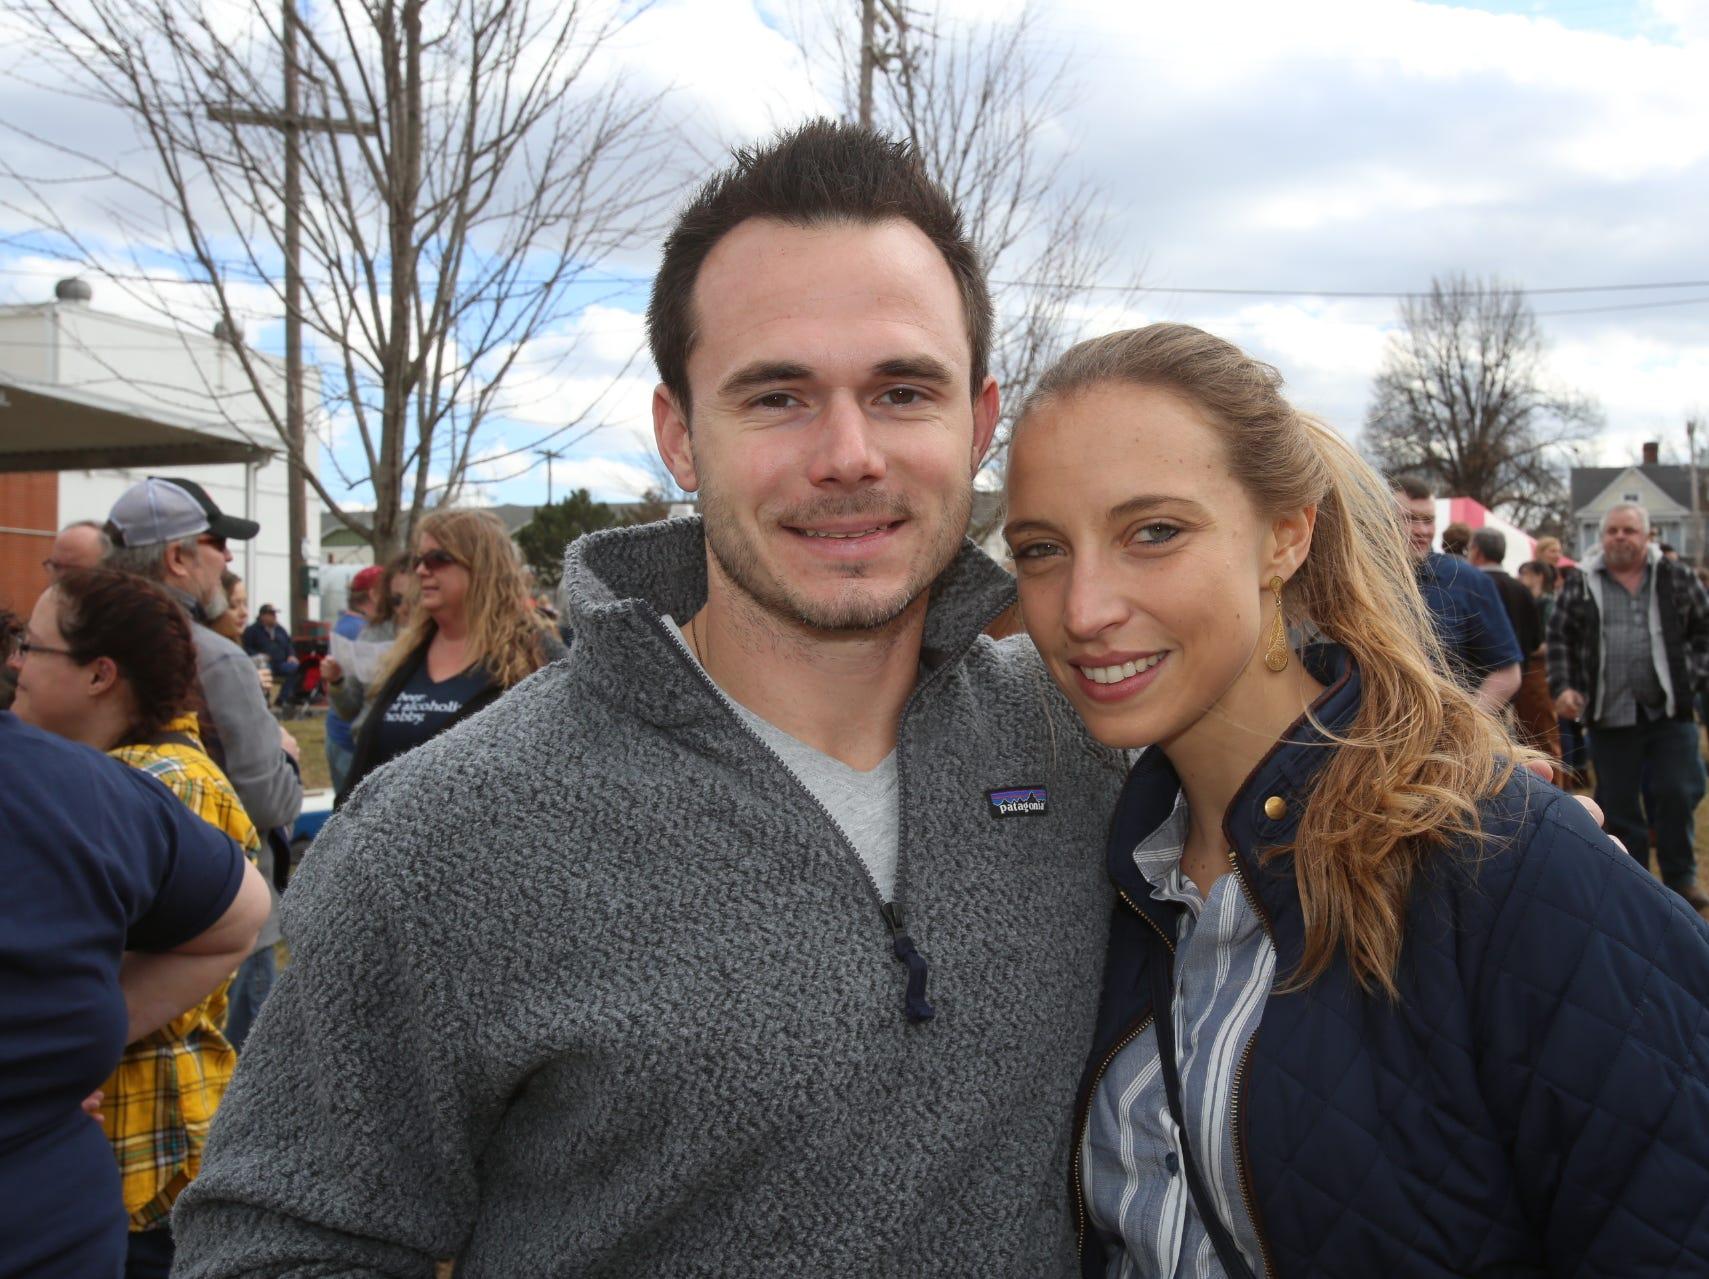 Danny and Cristina Collins